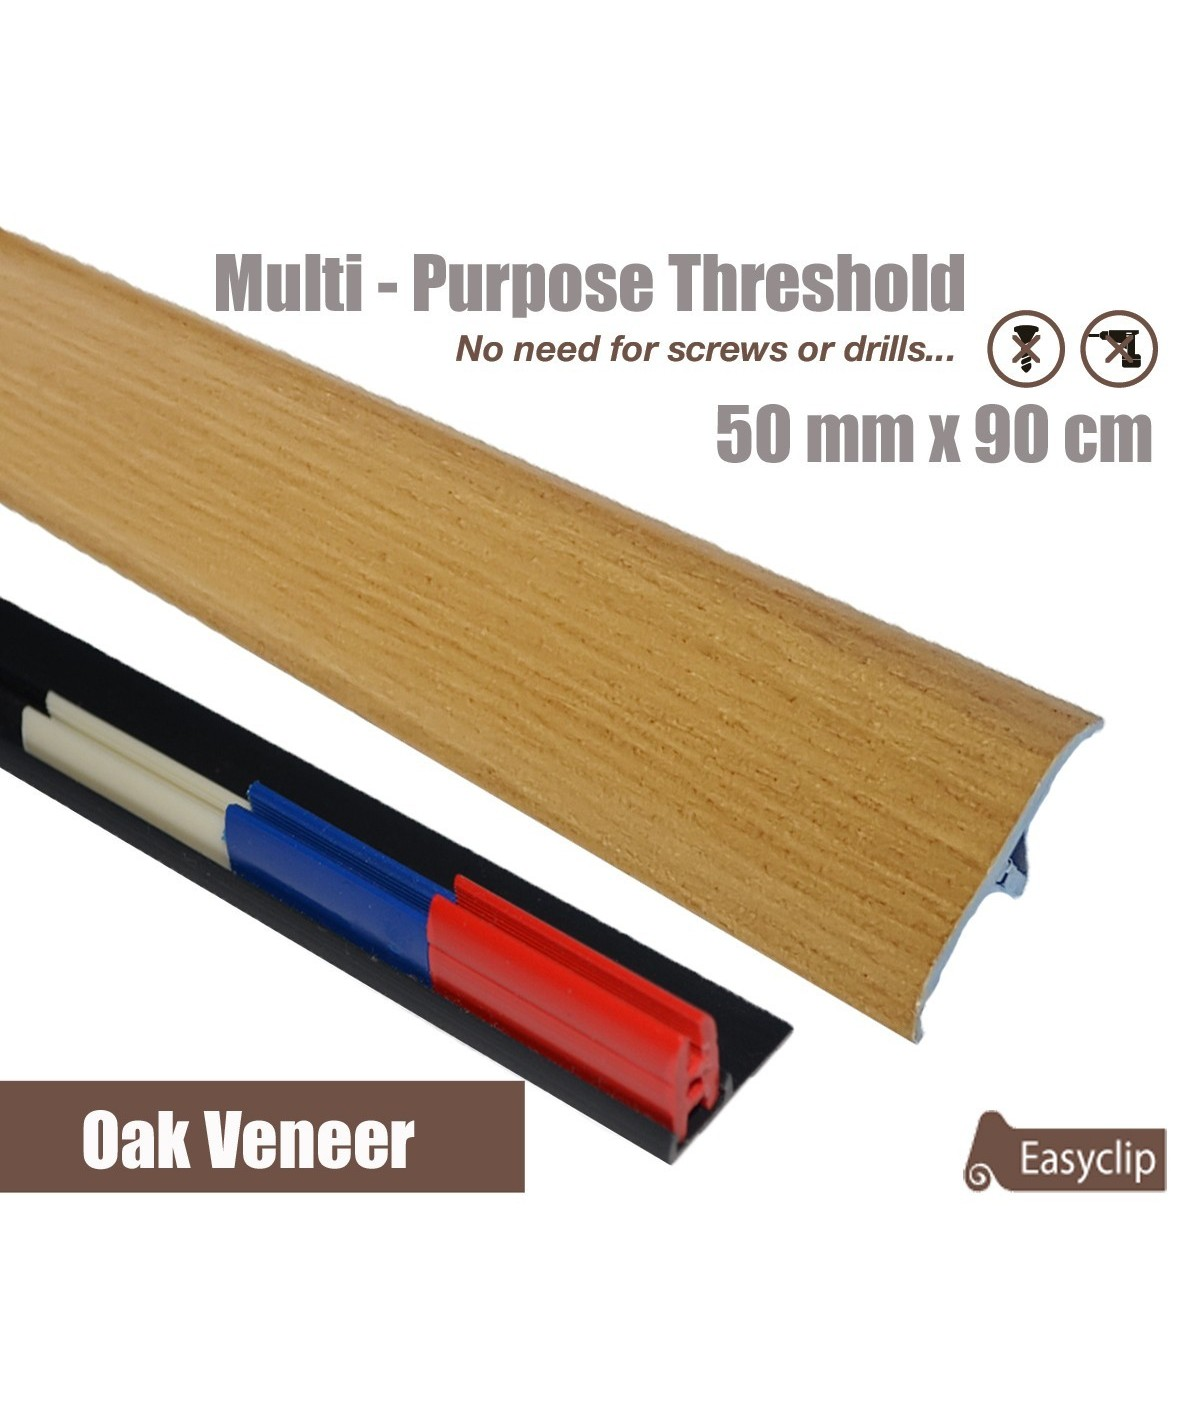 Oak Veneer Transition Threshold Strip  50mm x 90cm Multi-Height/Pivots